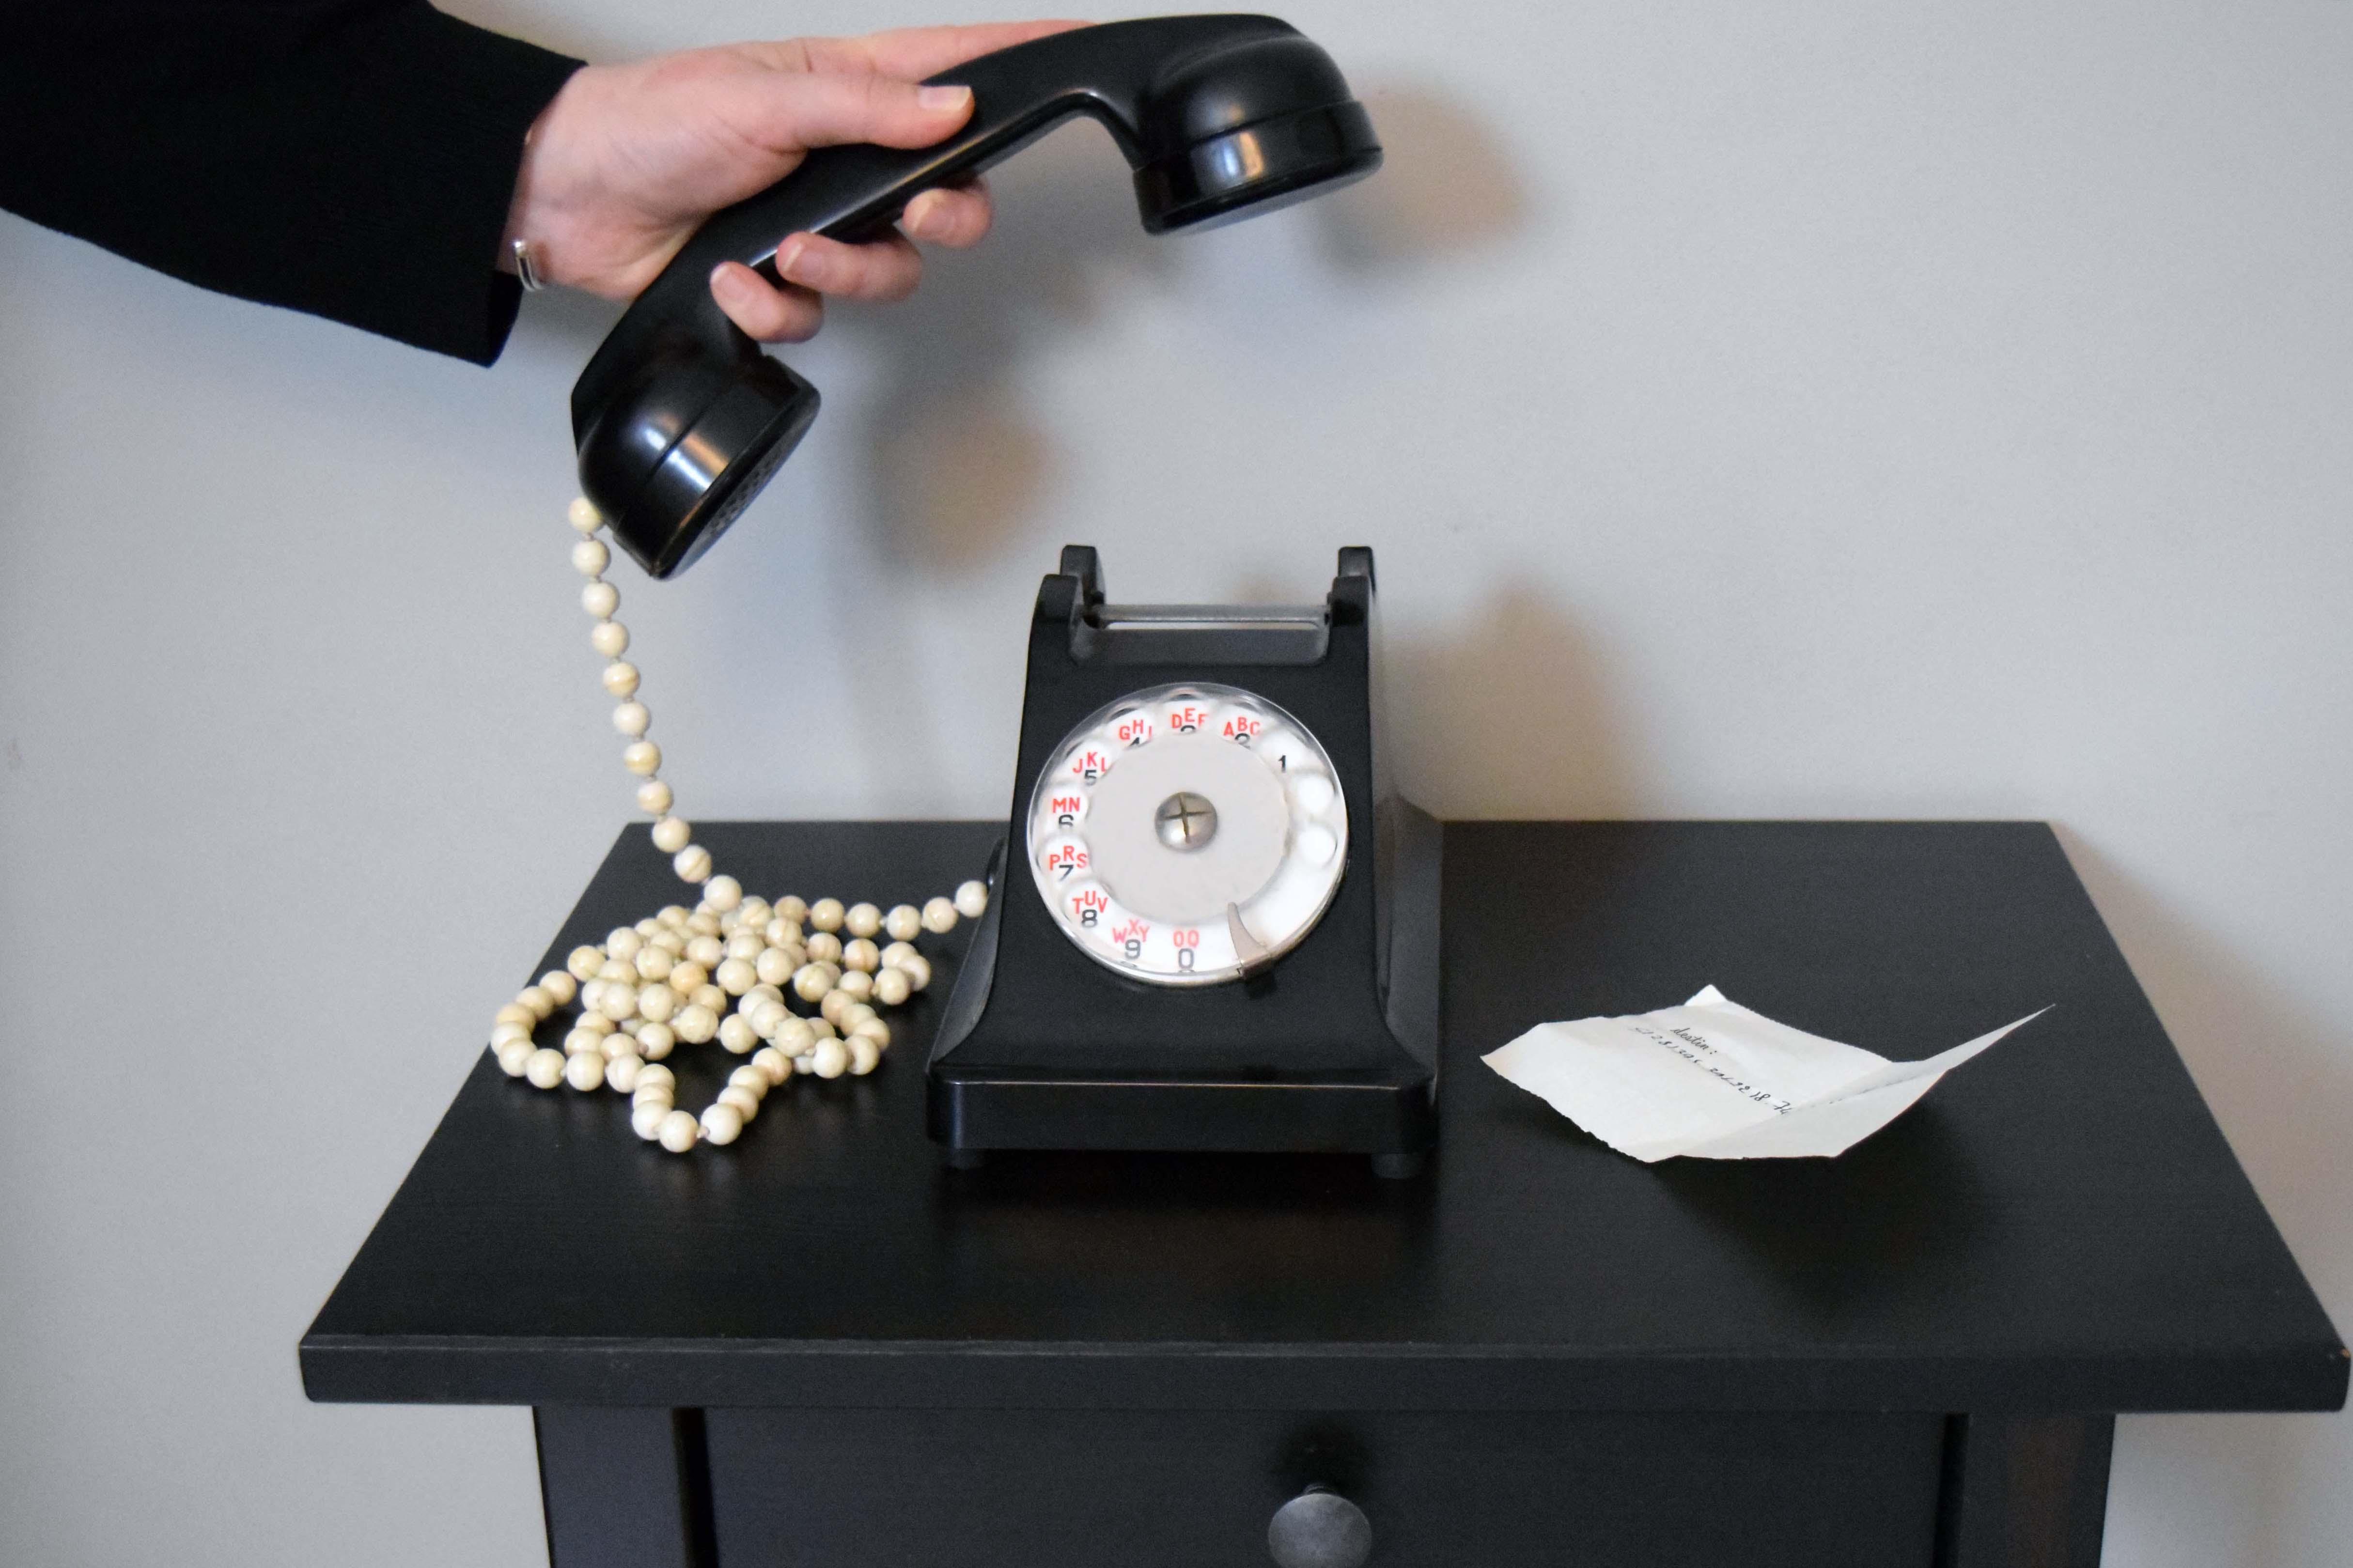 numerologie-destine-telephoner-au-destin